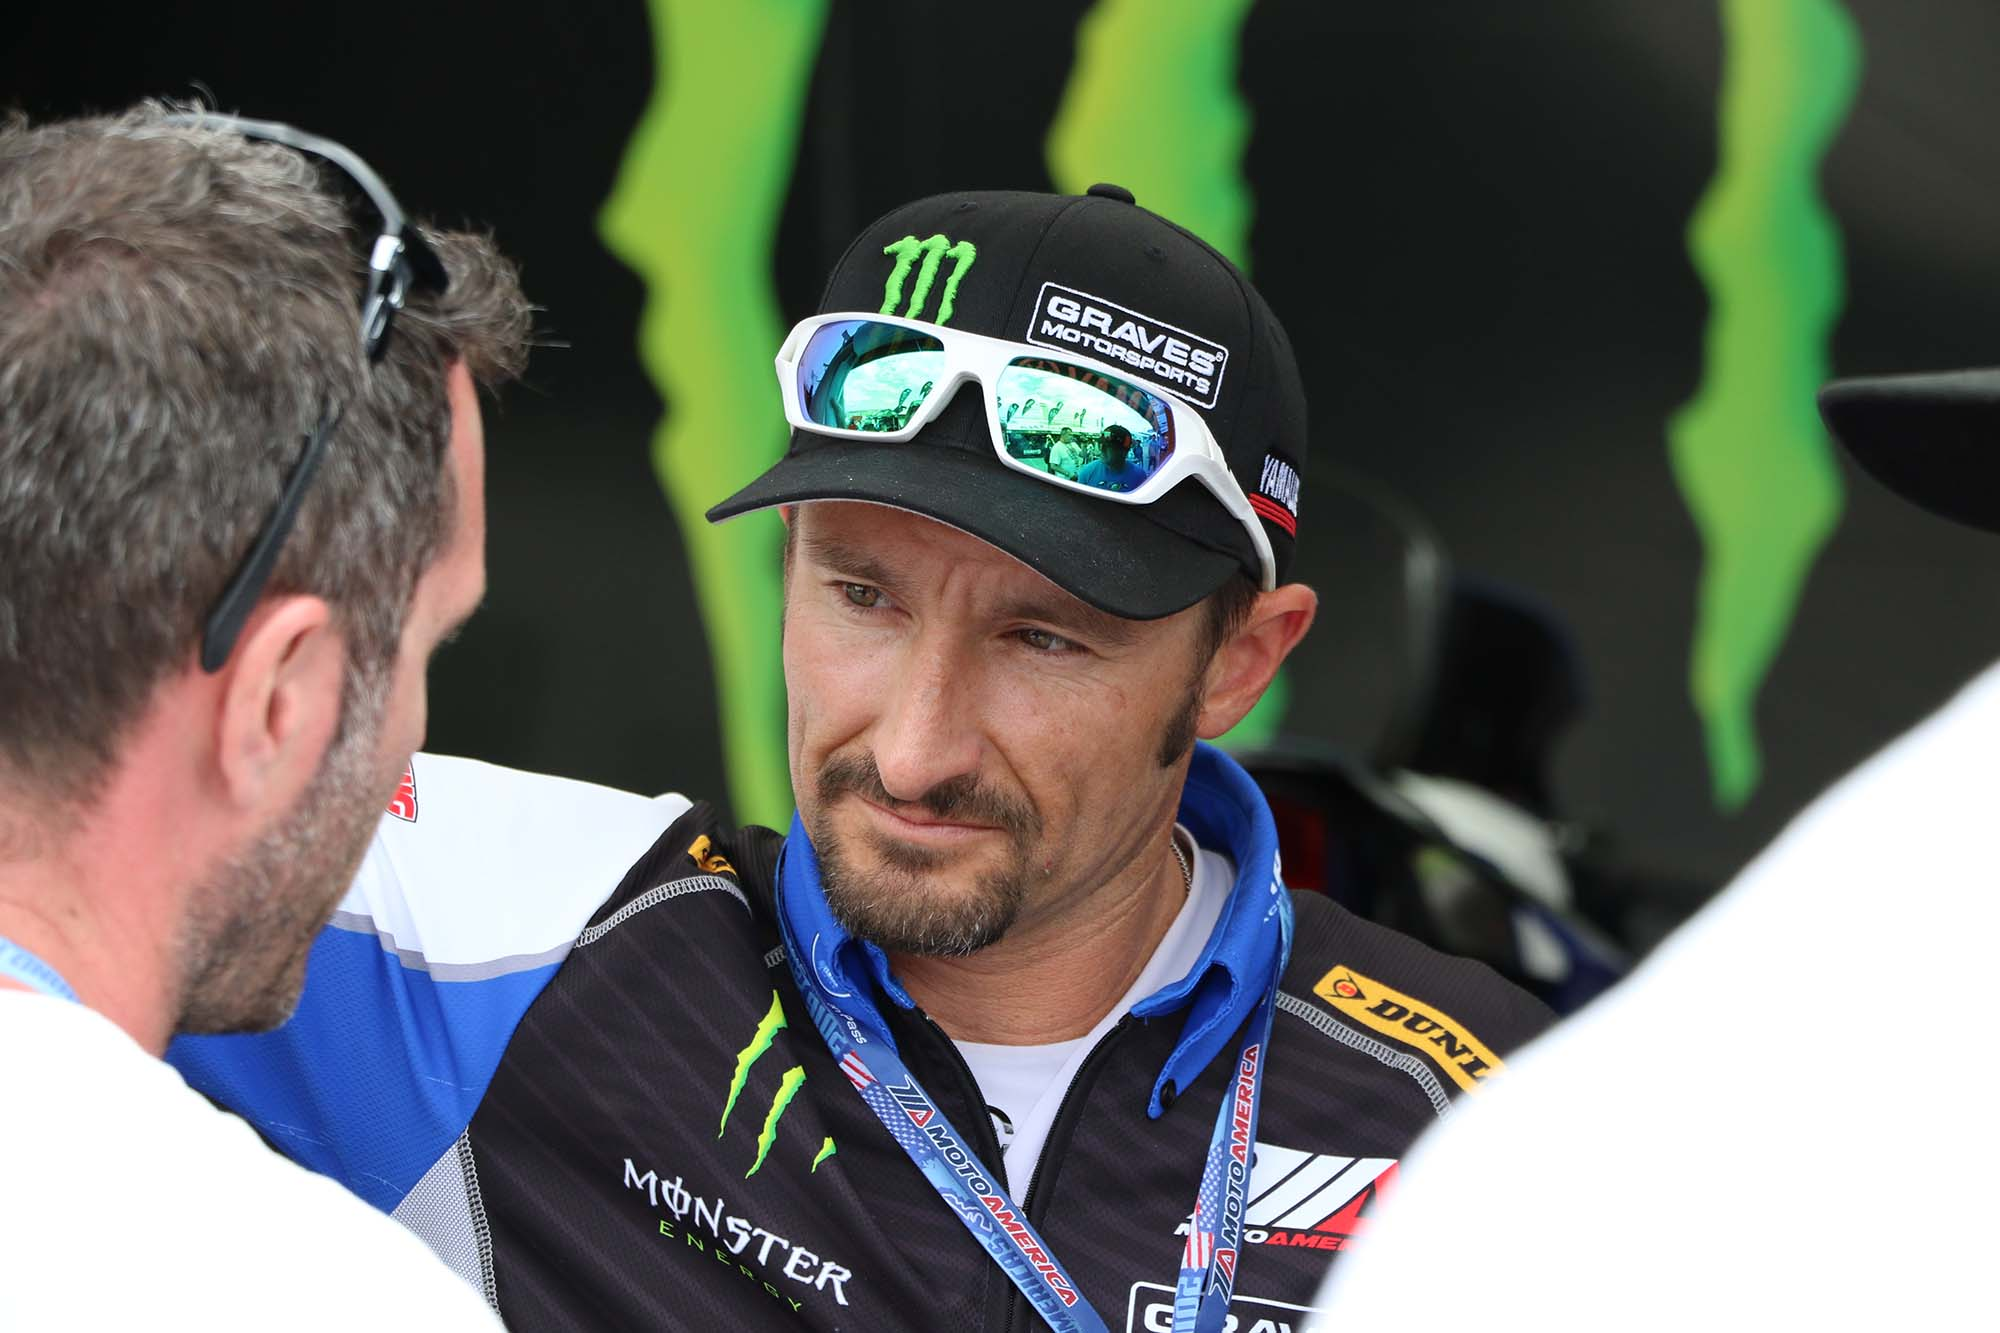 Cota Motogp 2015 Attendance   MotoGP 2017 Info, Video, Points Table